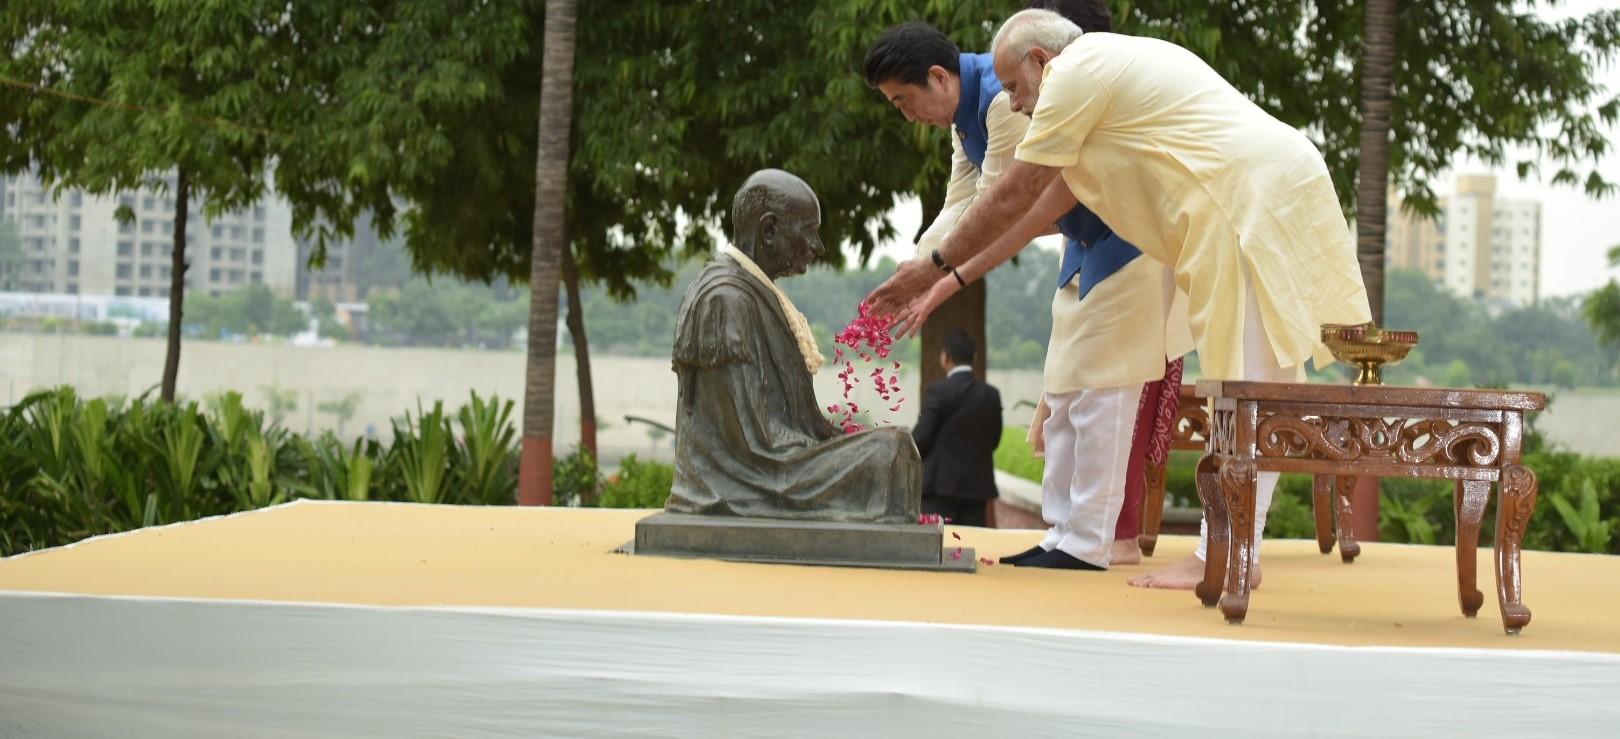 India's Prime Minister Modi and Japanese PM Shinzo Abe pay tributes to Mahatma Gandhi, at Sabarmati Ashram in Gujarat. (Photo: MEAPhotogallery/Flickr)